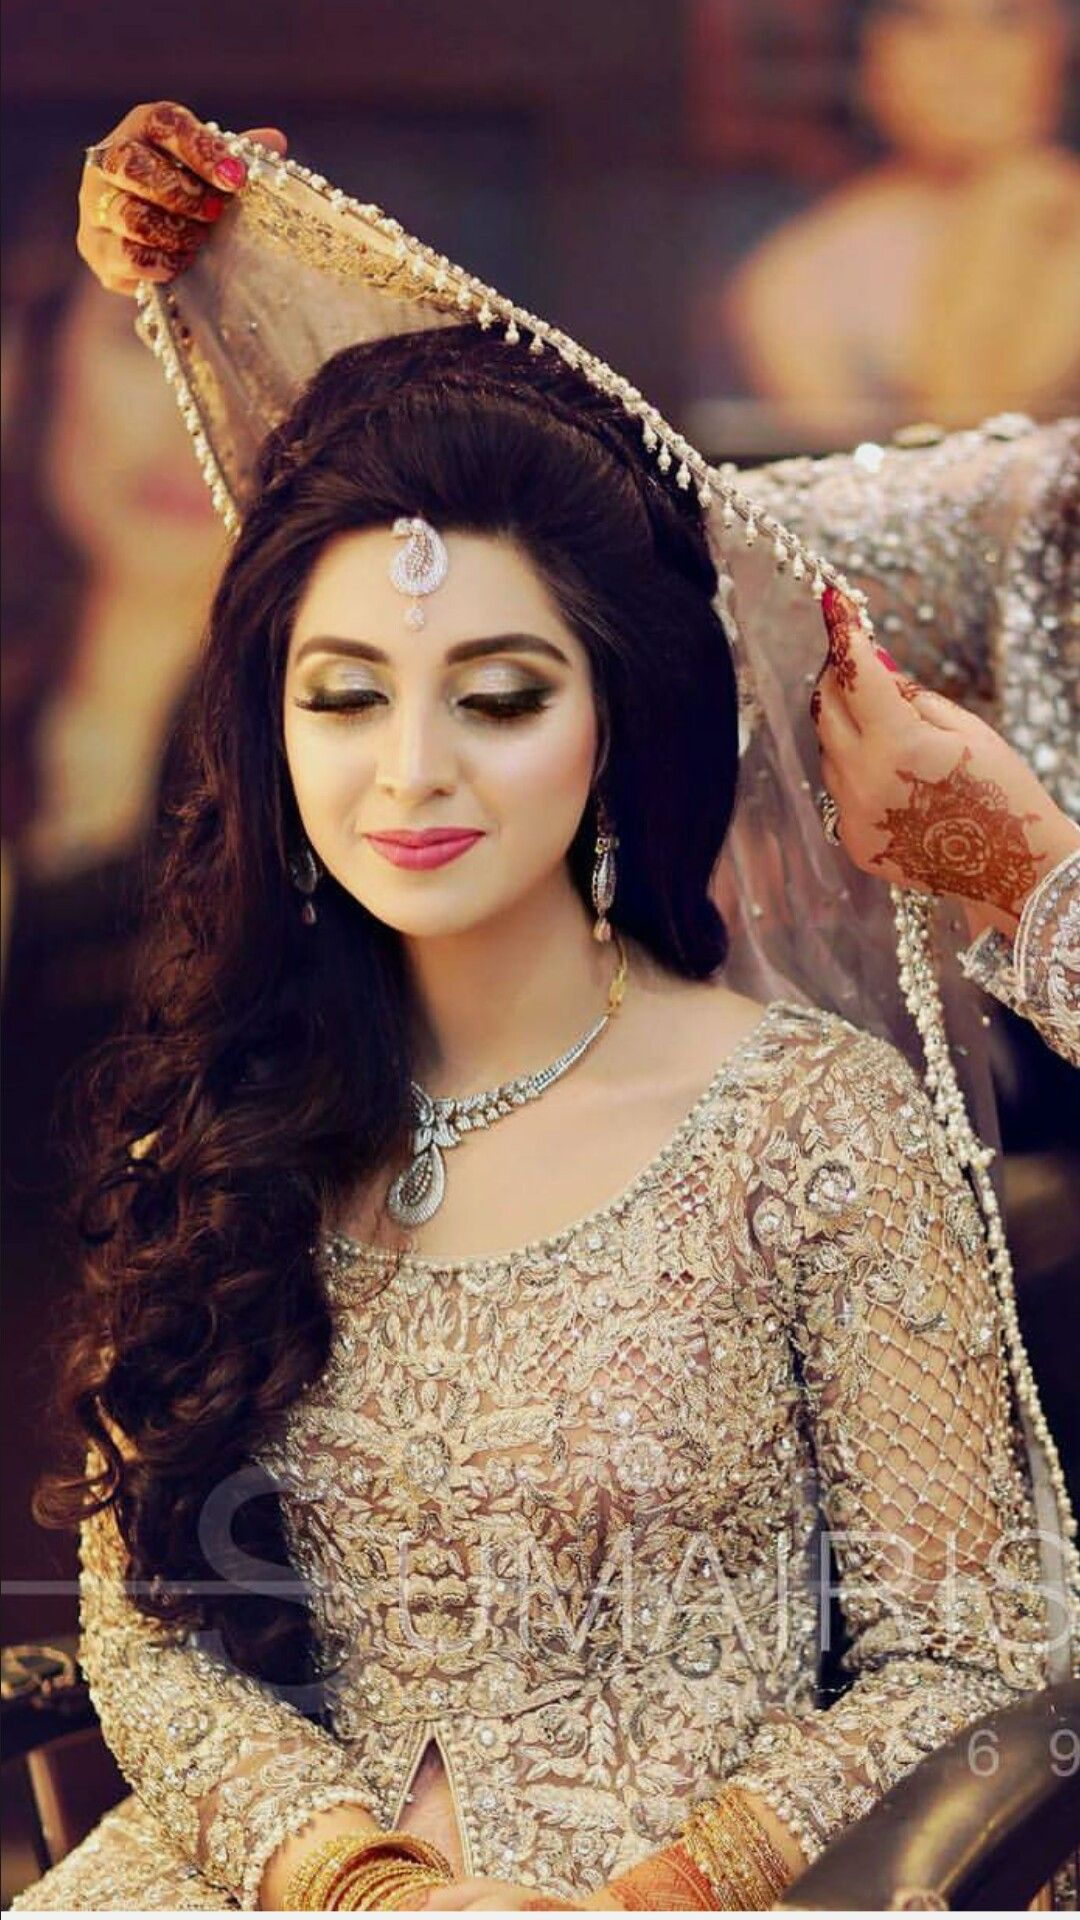 pin by mustajab batool on wedding dresses | bridal makeup